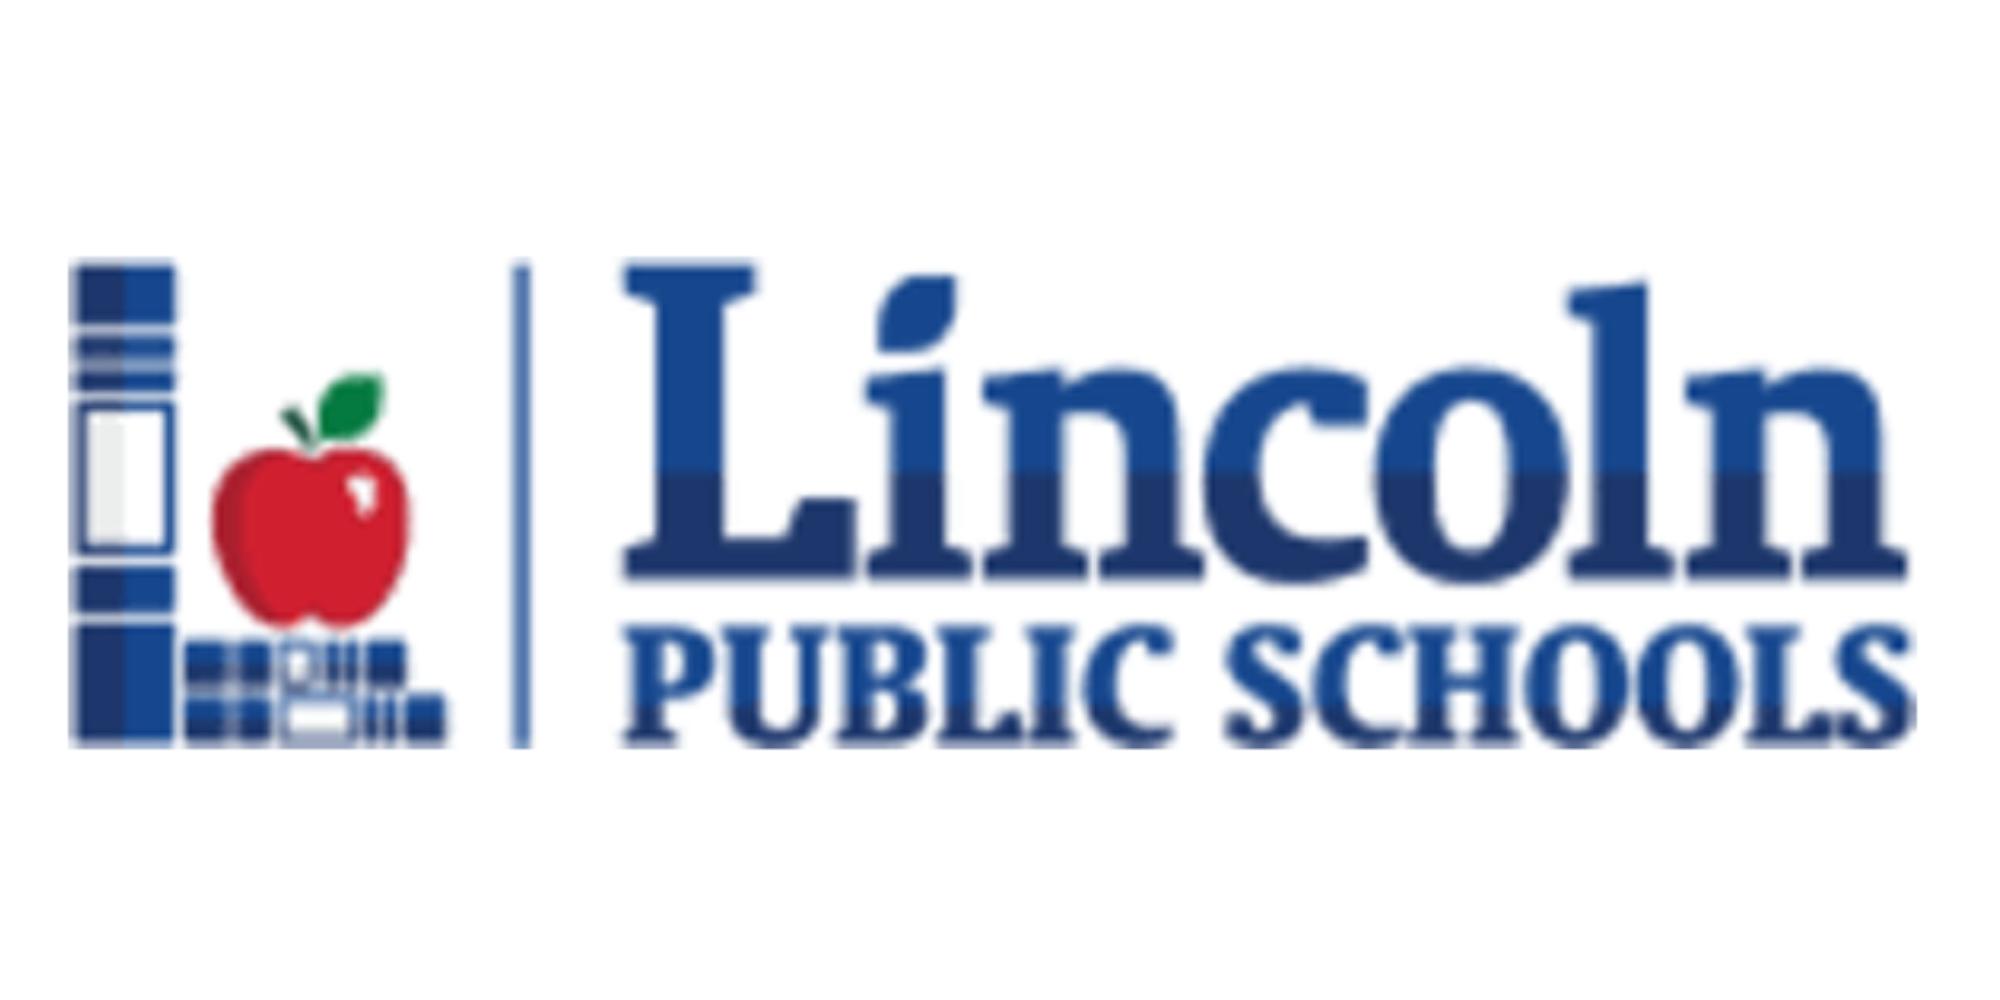 Lincoln Public Schools